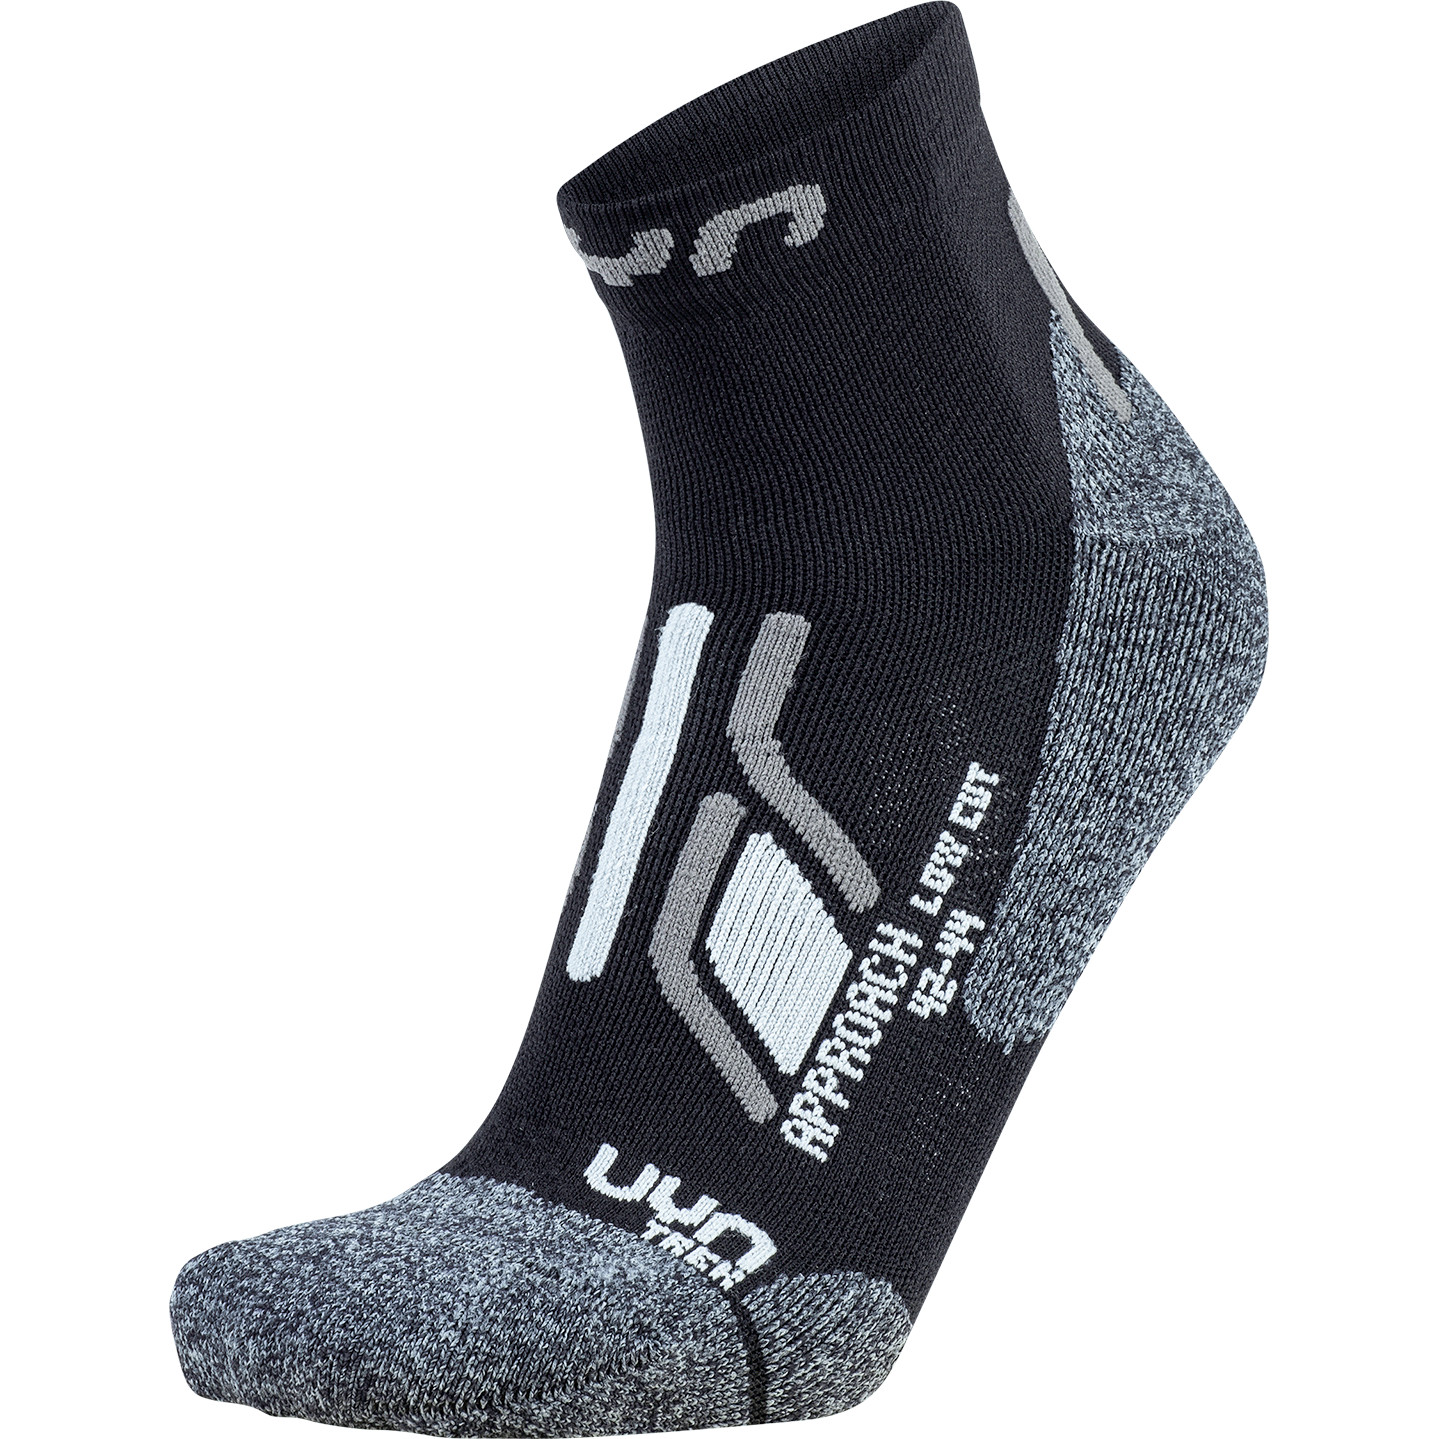 UYN Man Trekking Approach Low Cut Socks - Black/Grey